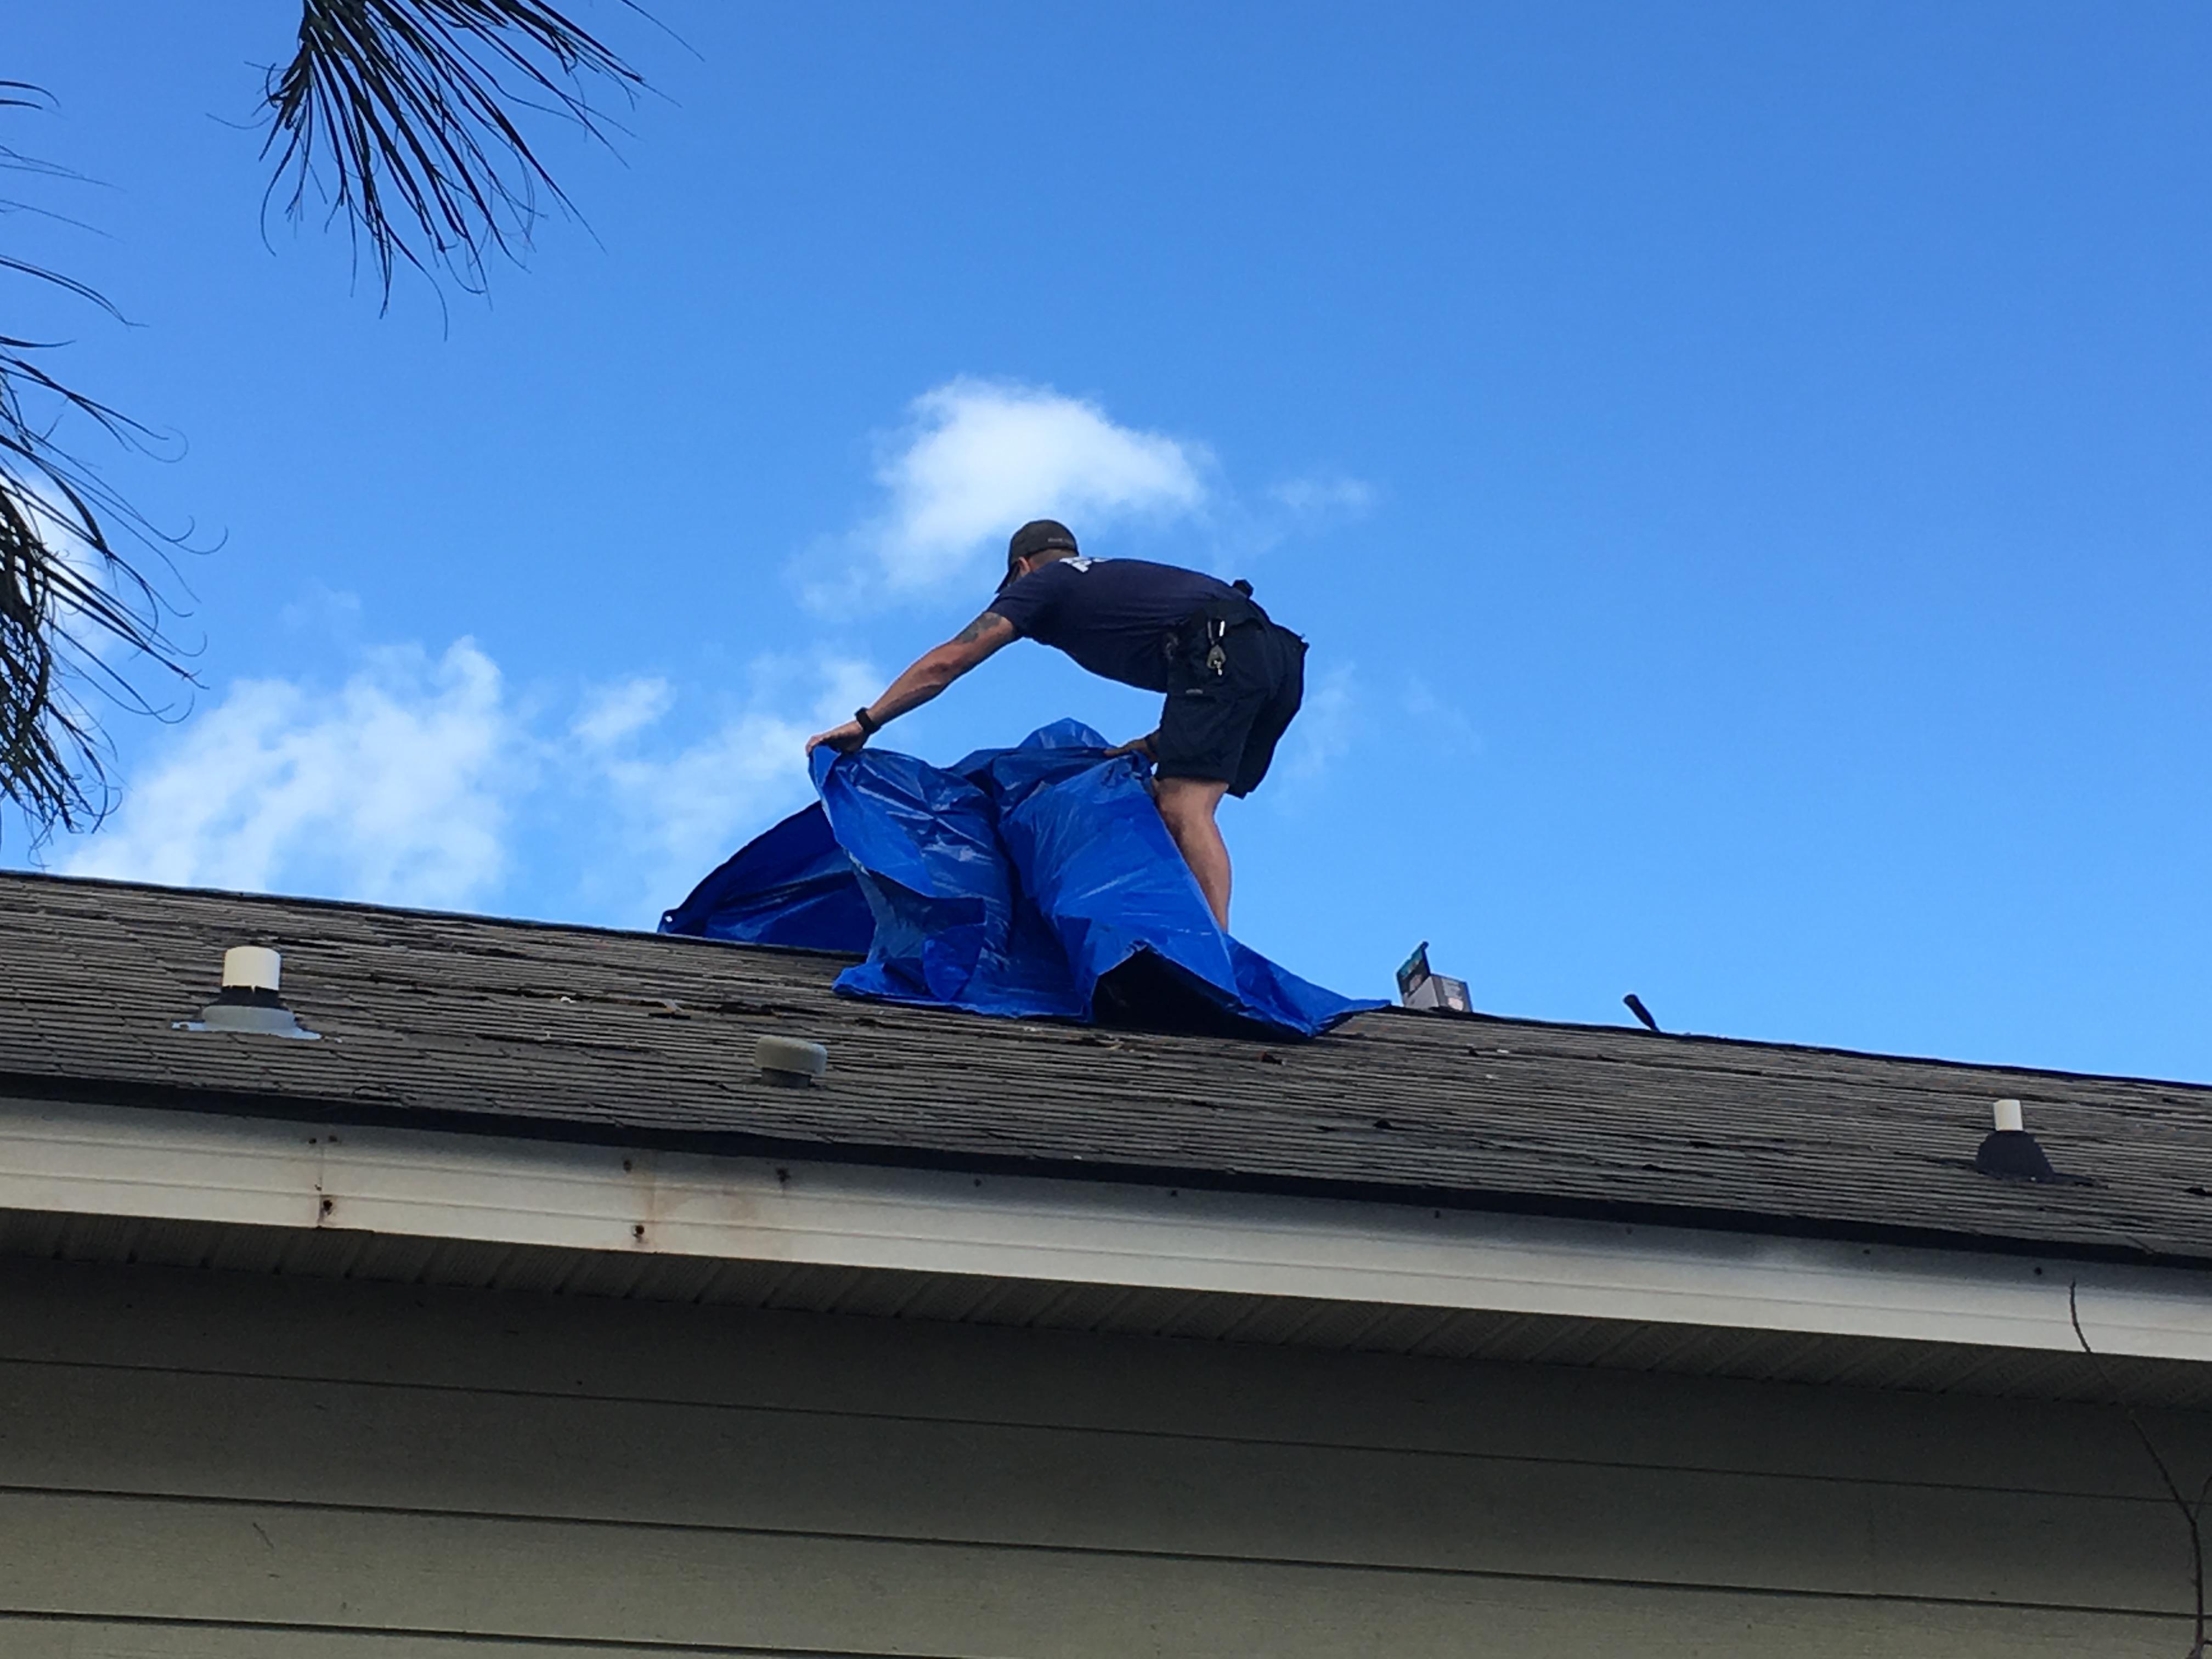 Miami officer places tarp on hurricane-damaged roof. (Photo: Courtesy of Javier Ortiz)